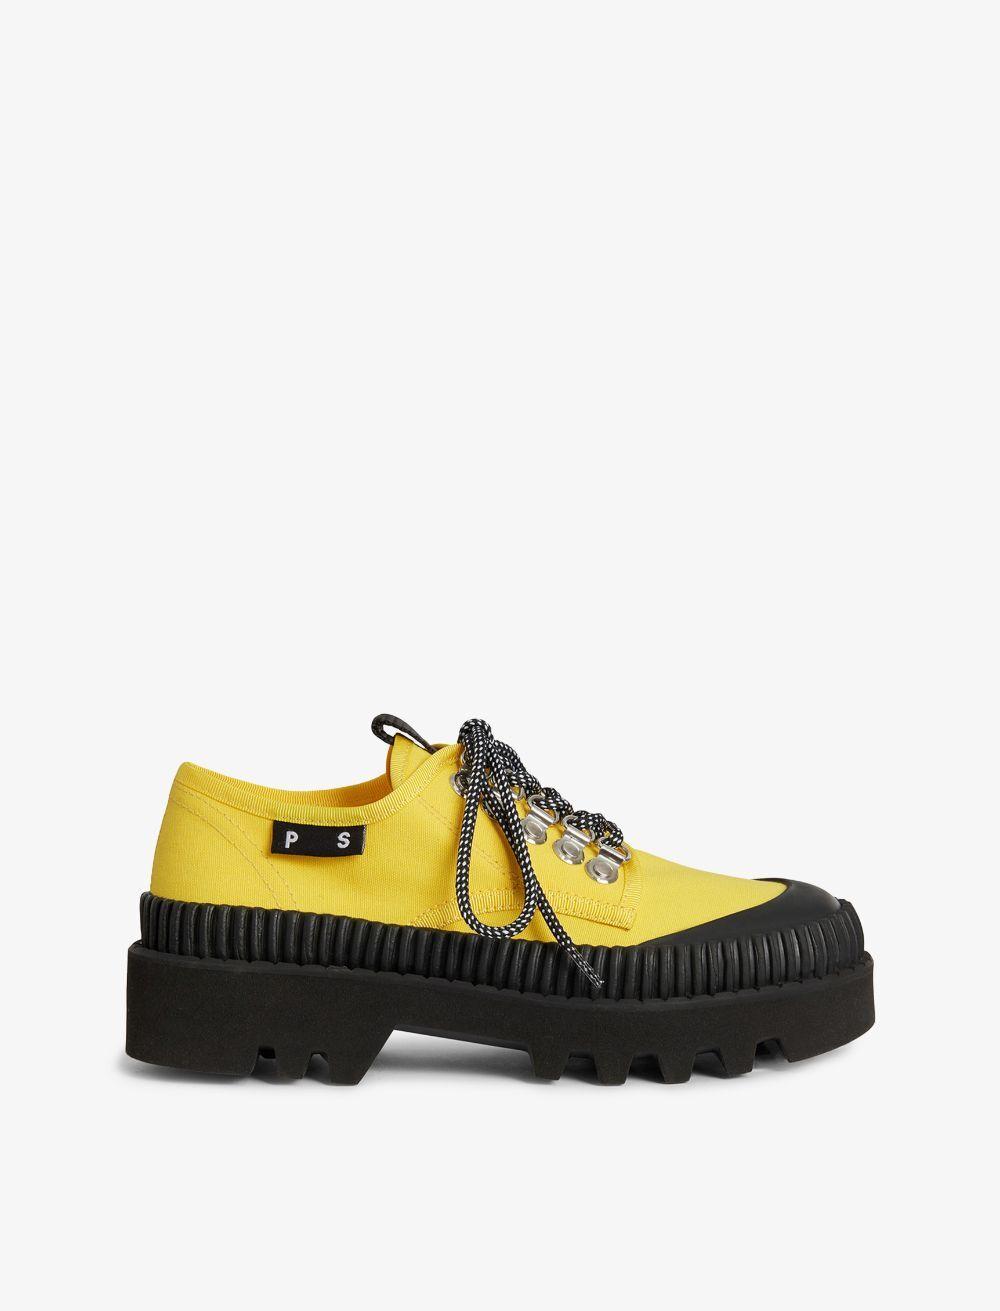 Proenza Schouler City Lug Sole Shoes 206 yellow 37